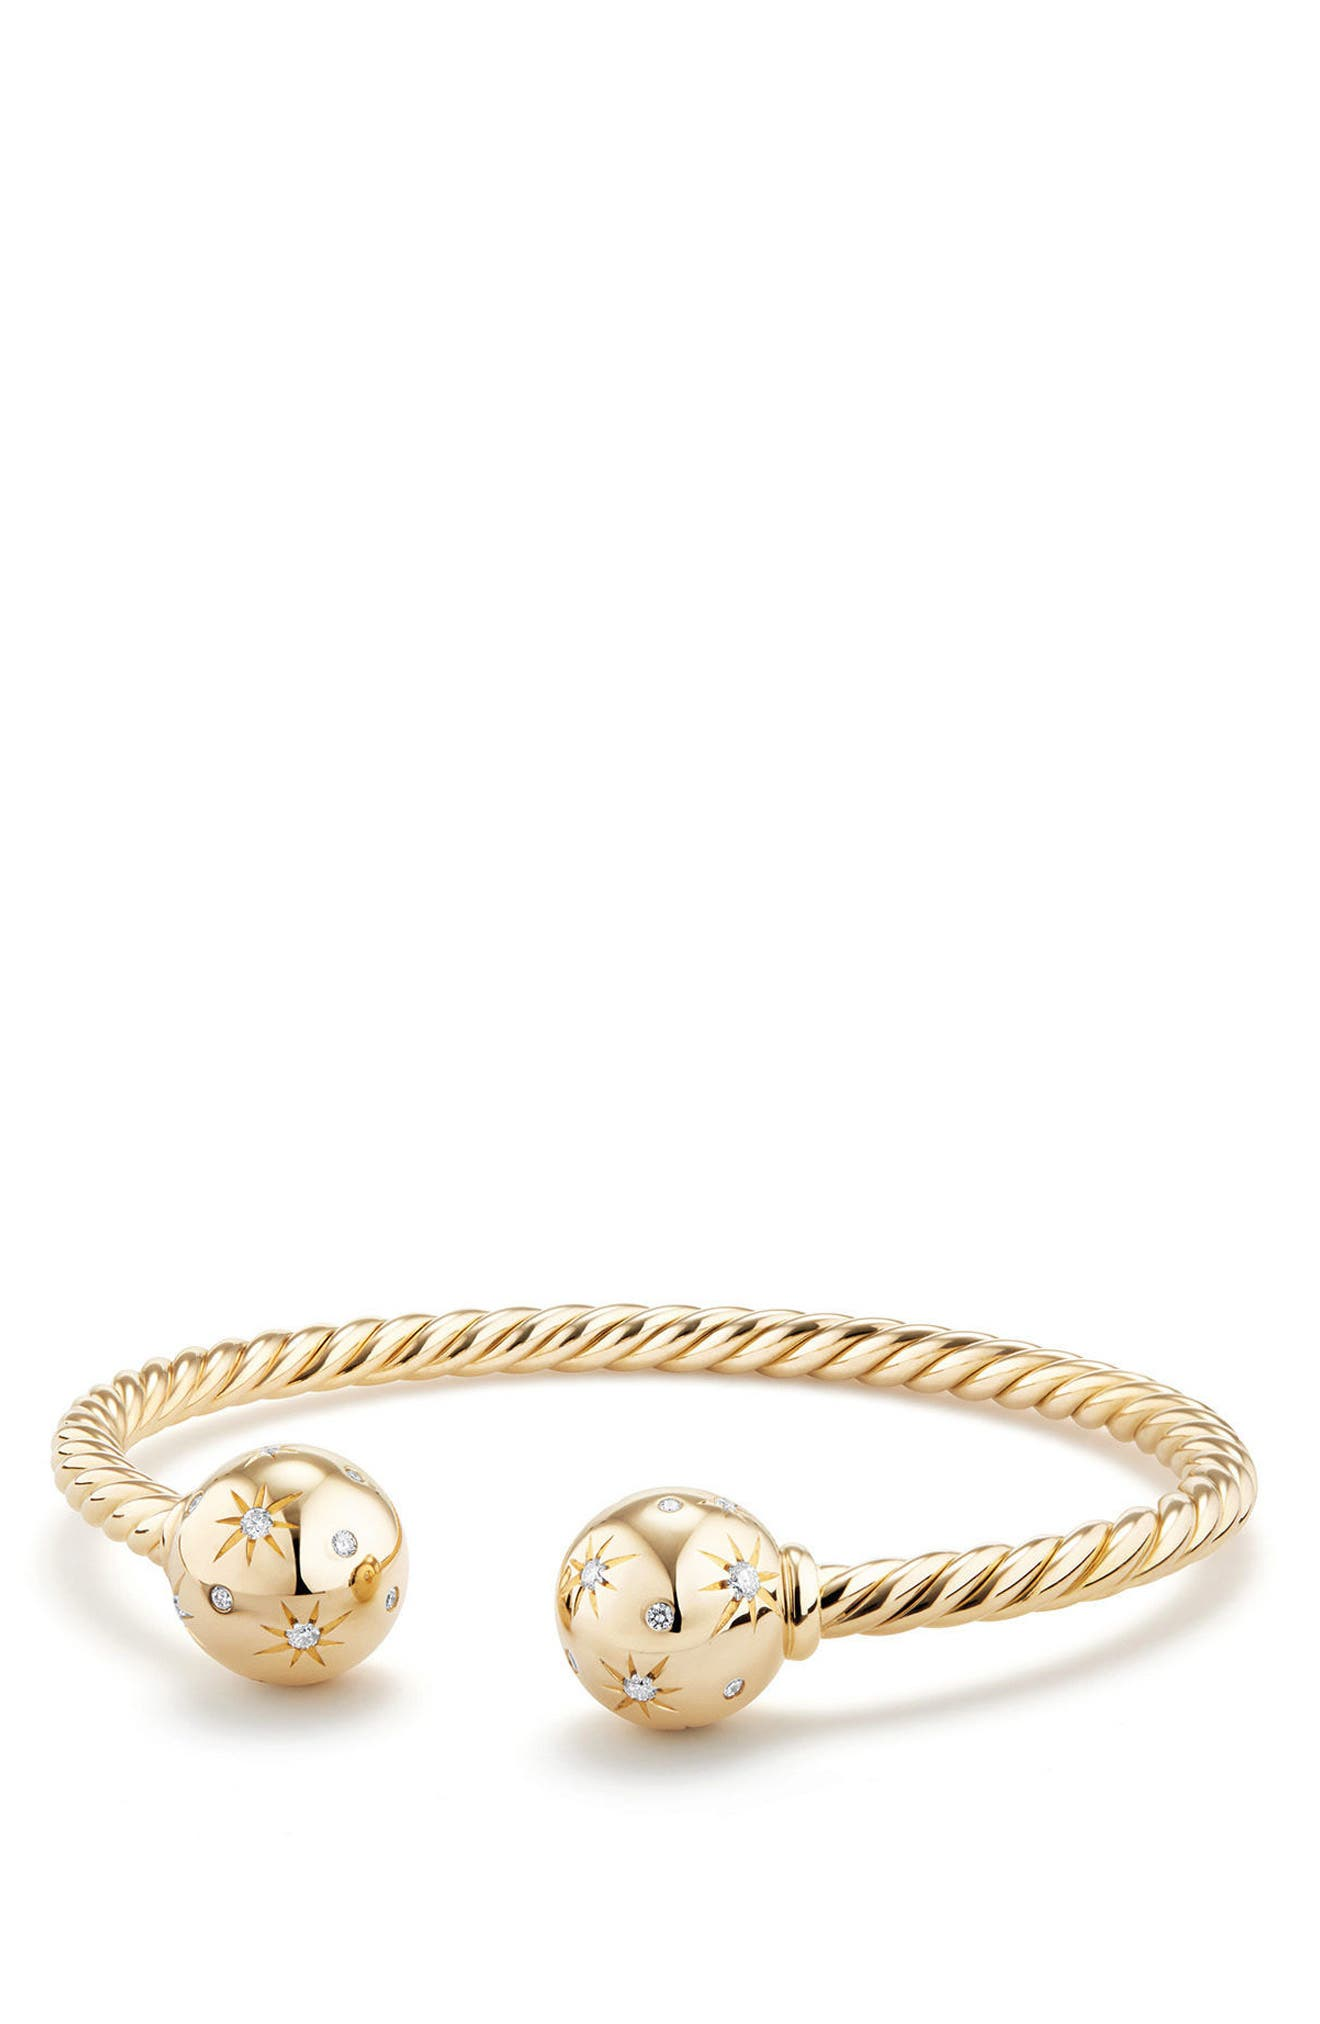 Alternate Image 1 Selected - David Yurman Solari Bead Bracelet with Diamonds in 18K Gold